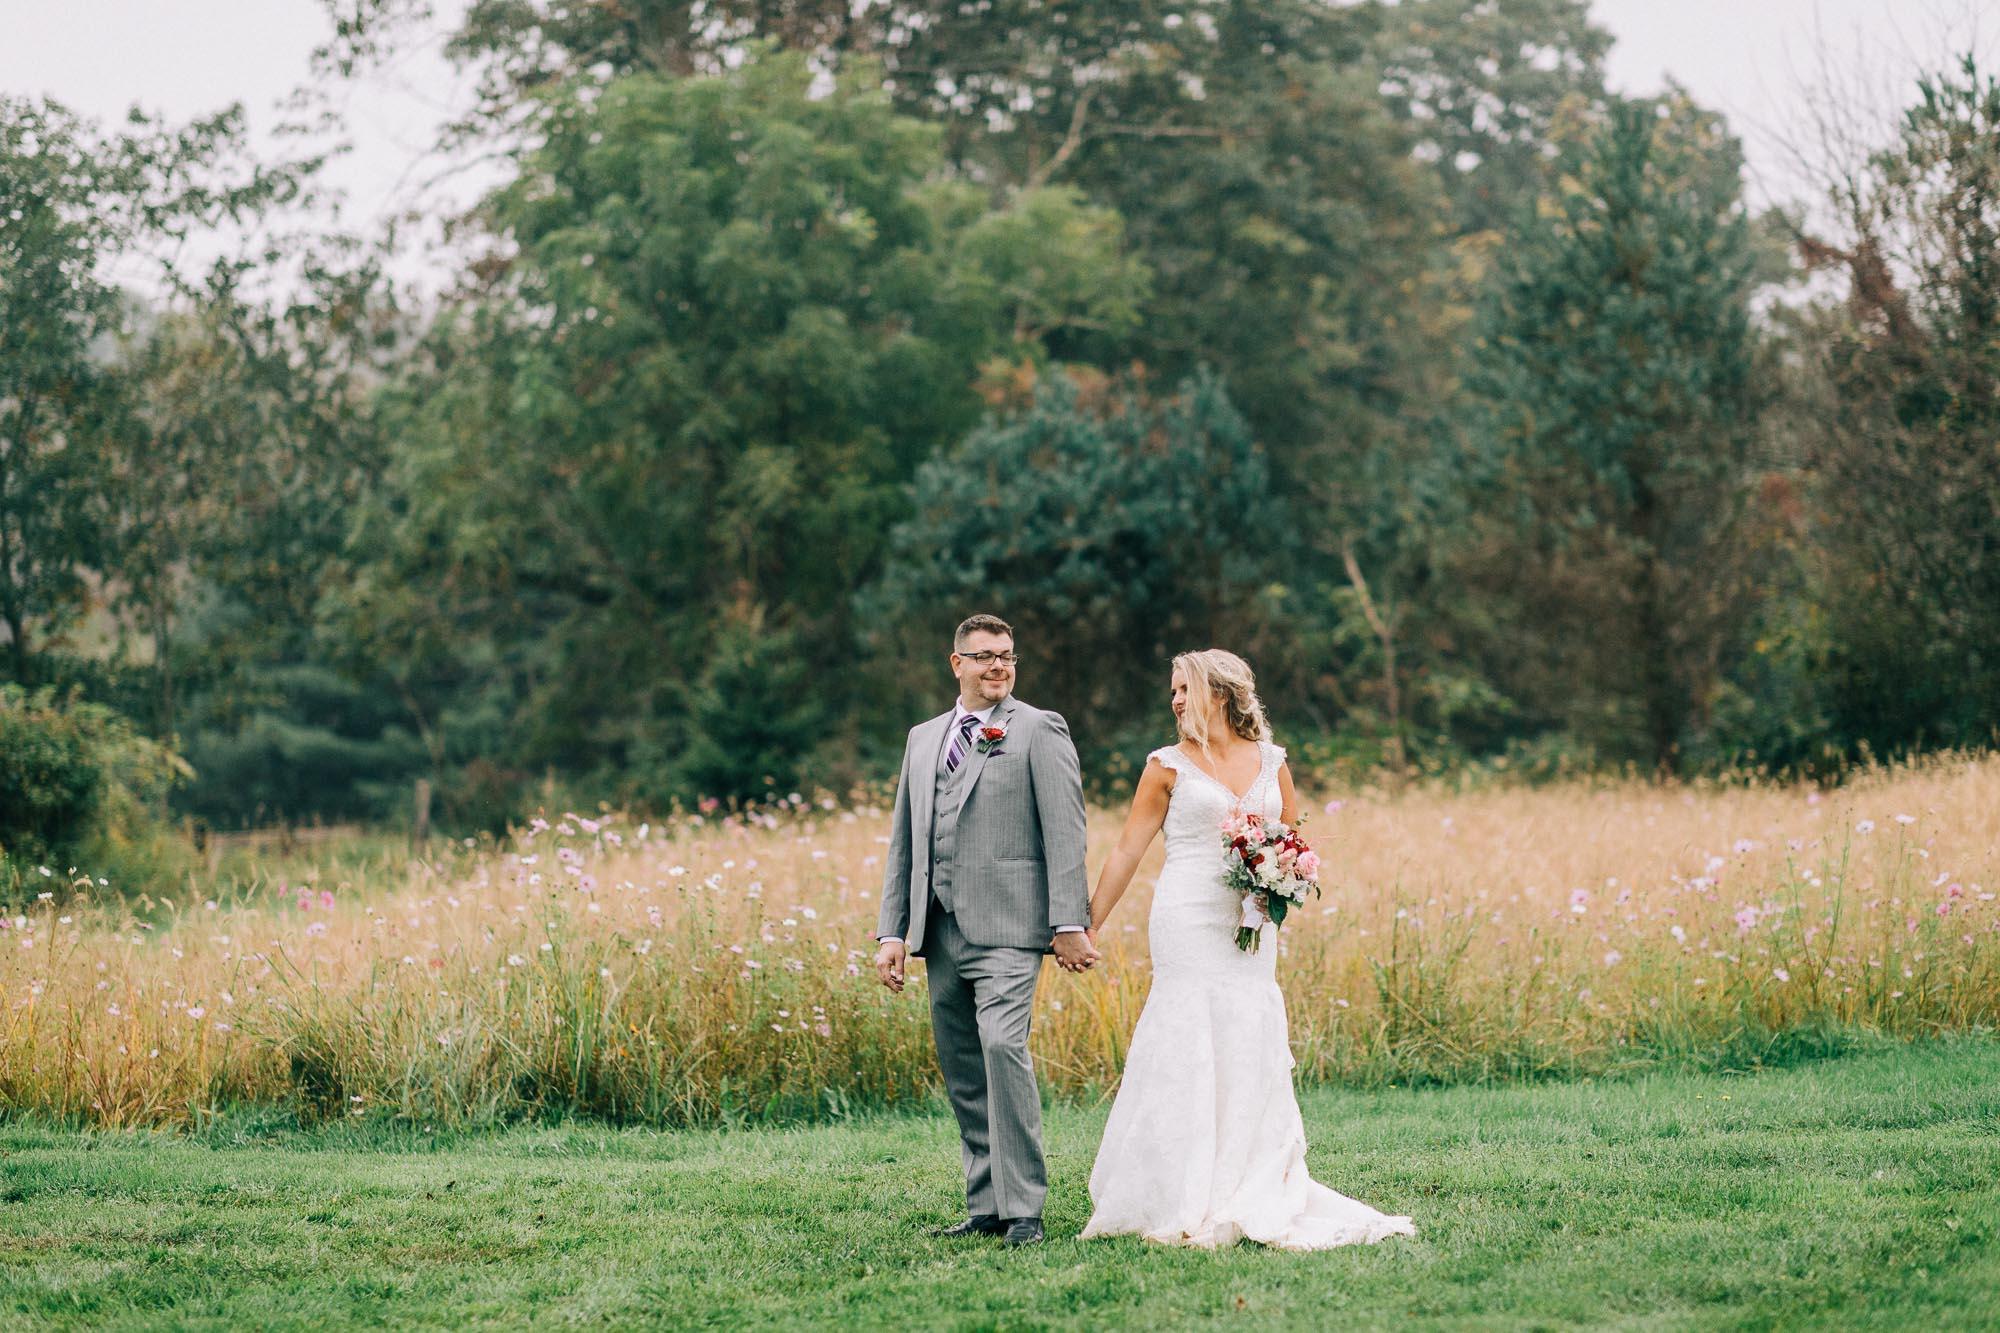 Lodge-at-Raven-Creek-October-wedding-60.jpg